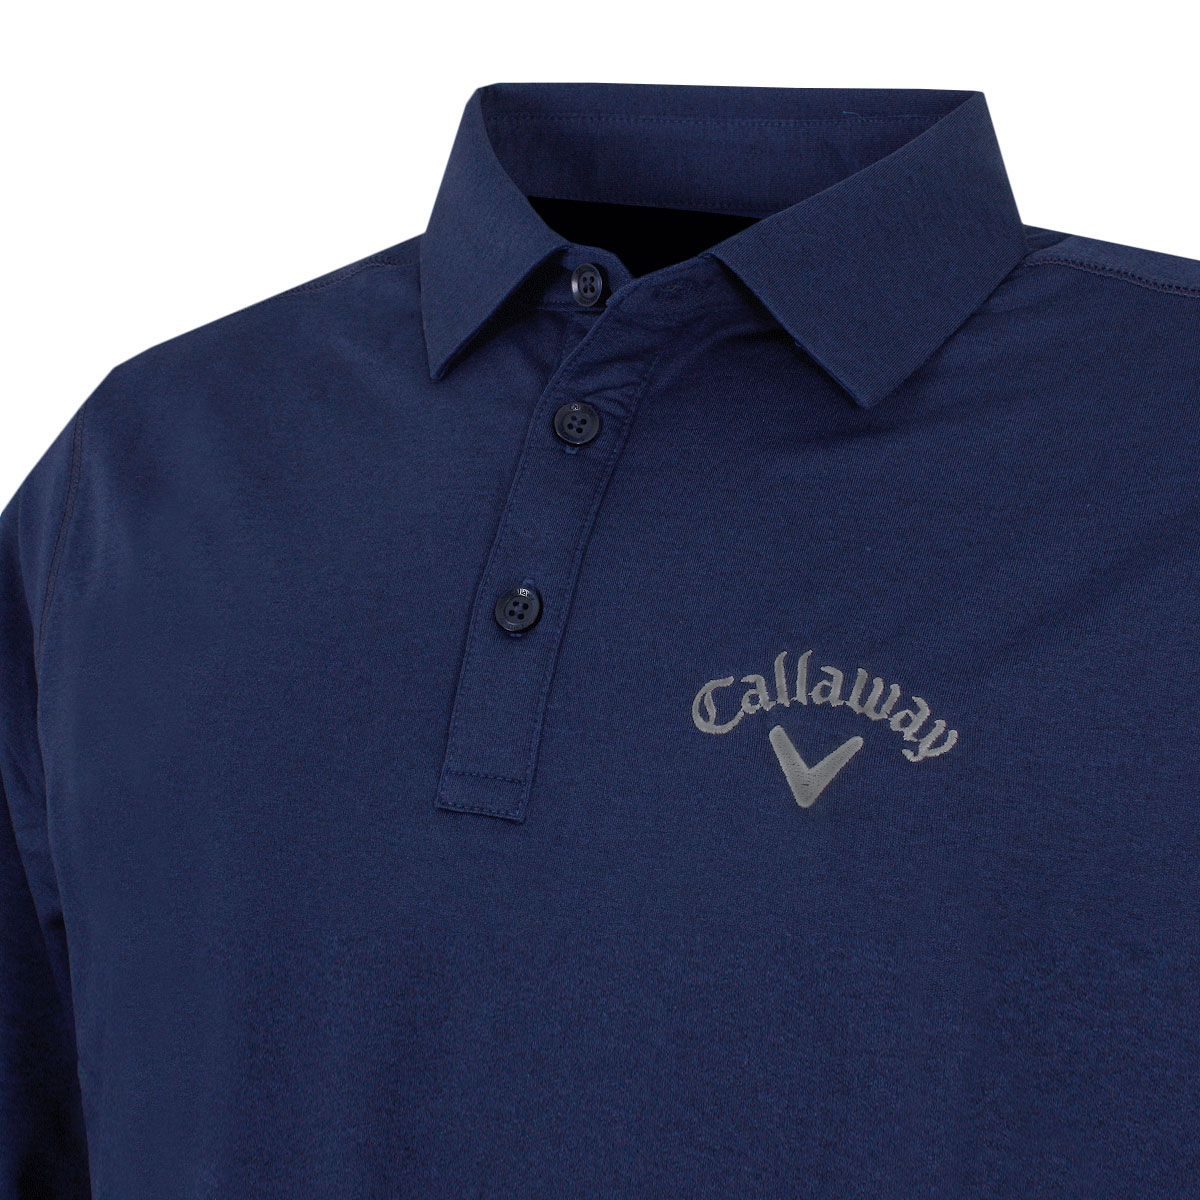 Callaway-Golf-Mens-2019-Long-Sleeve-Stretch-Opti-Dri-Polo-Shirt thumbnail 4